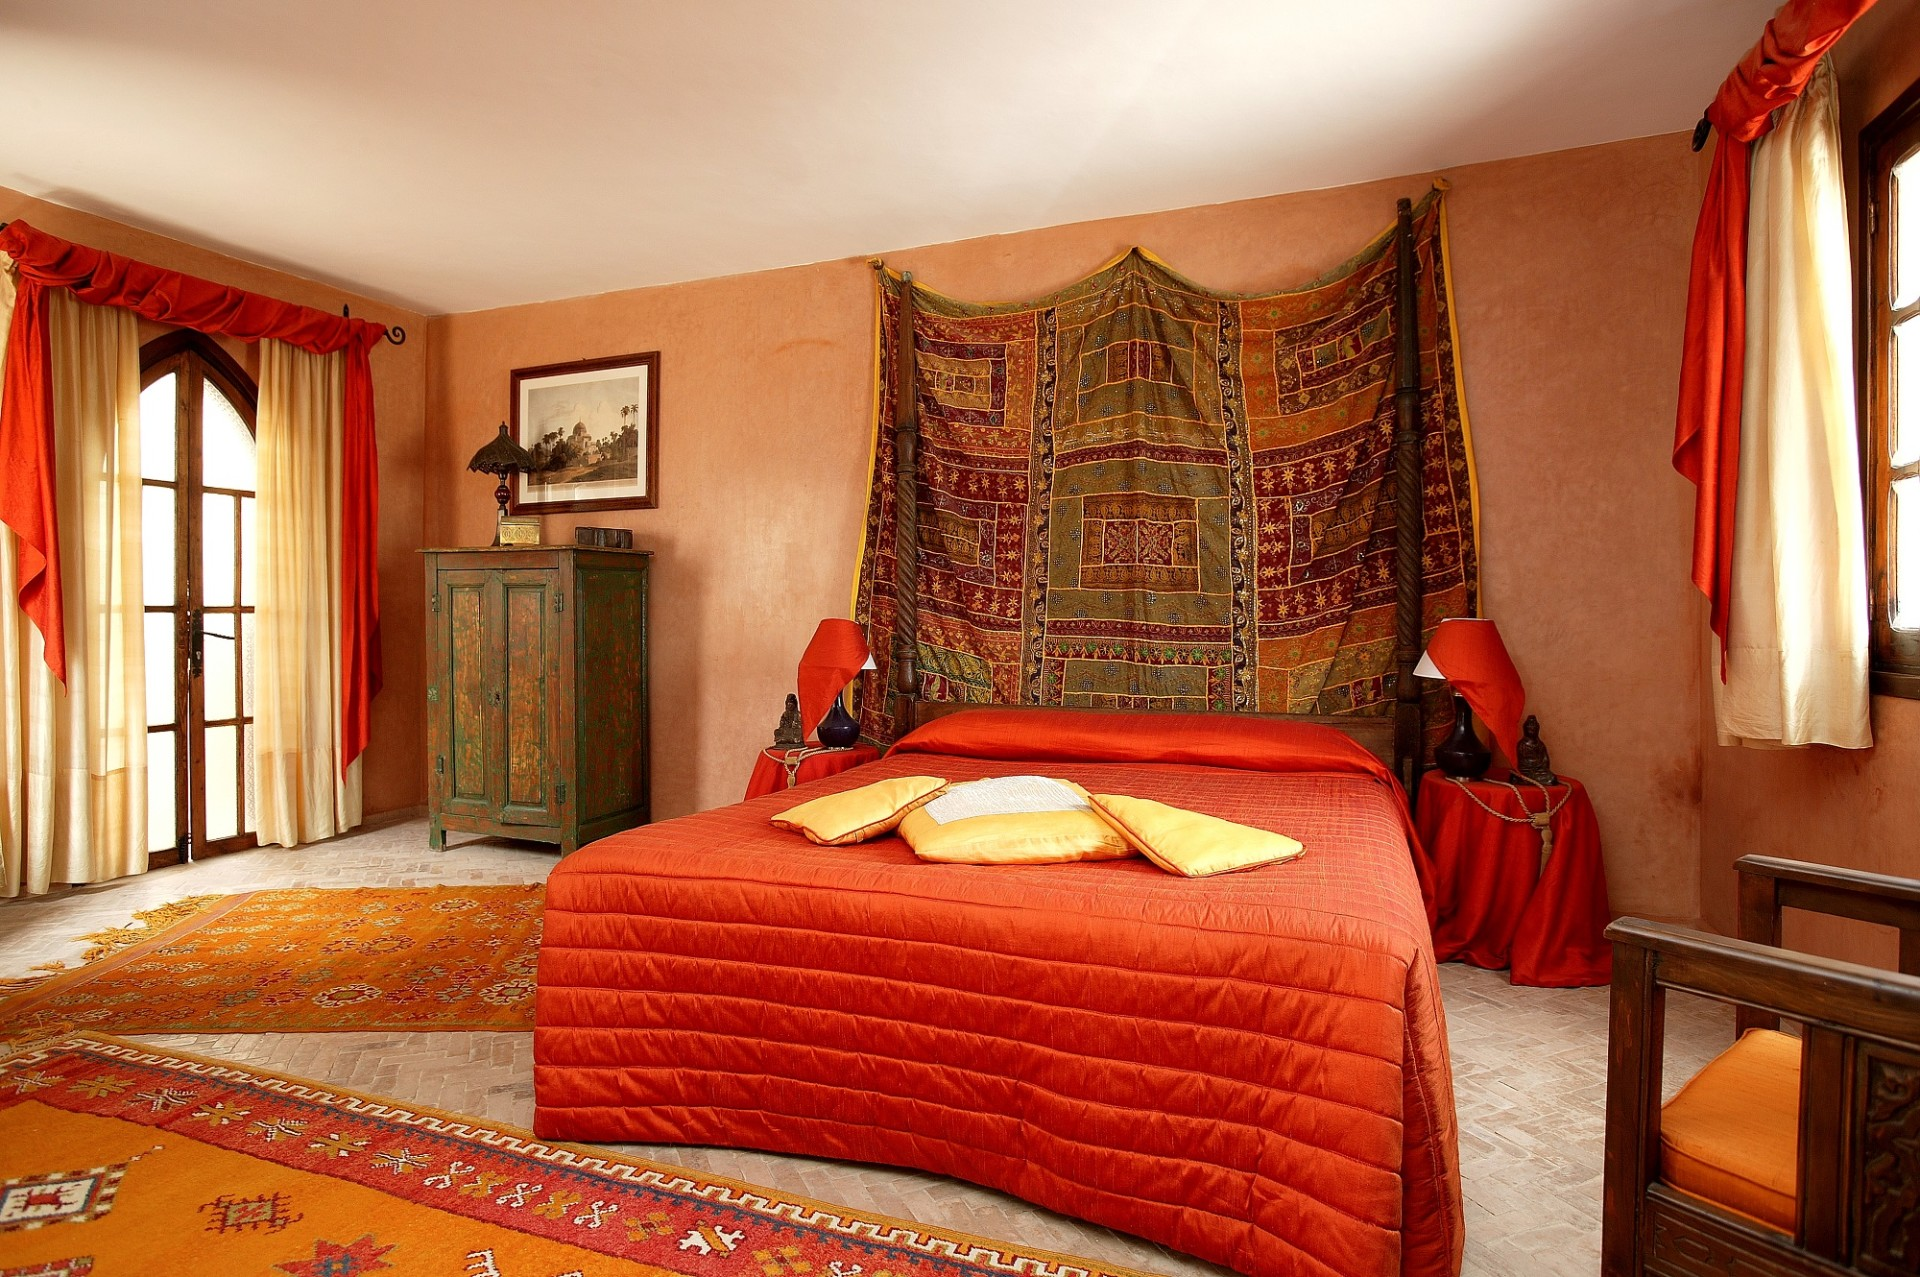 Kamer in Riad Dama, Marrakech, Marokko